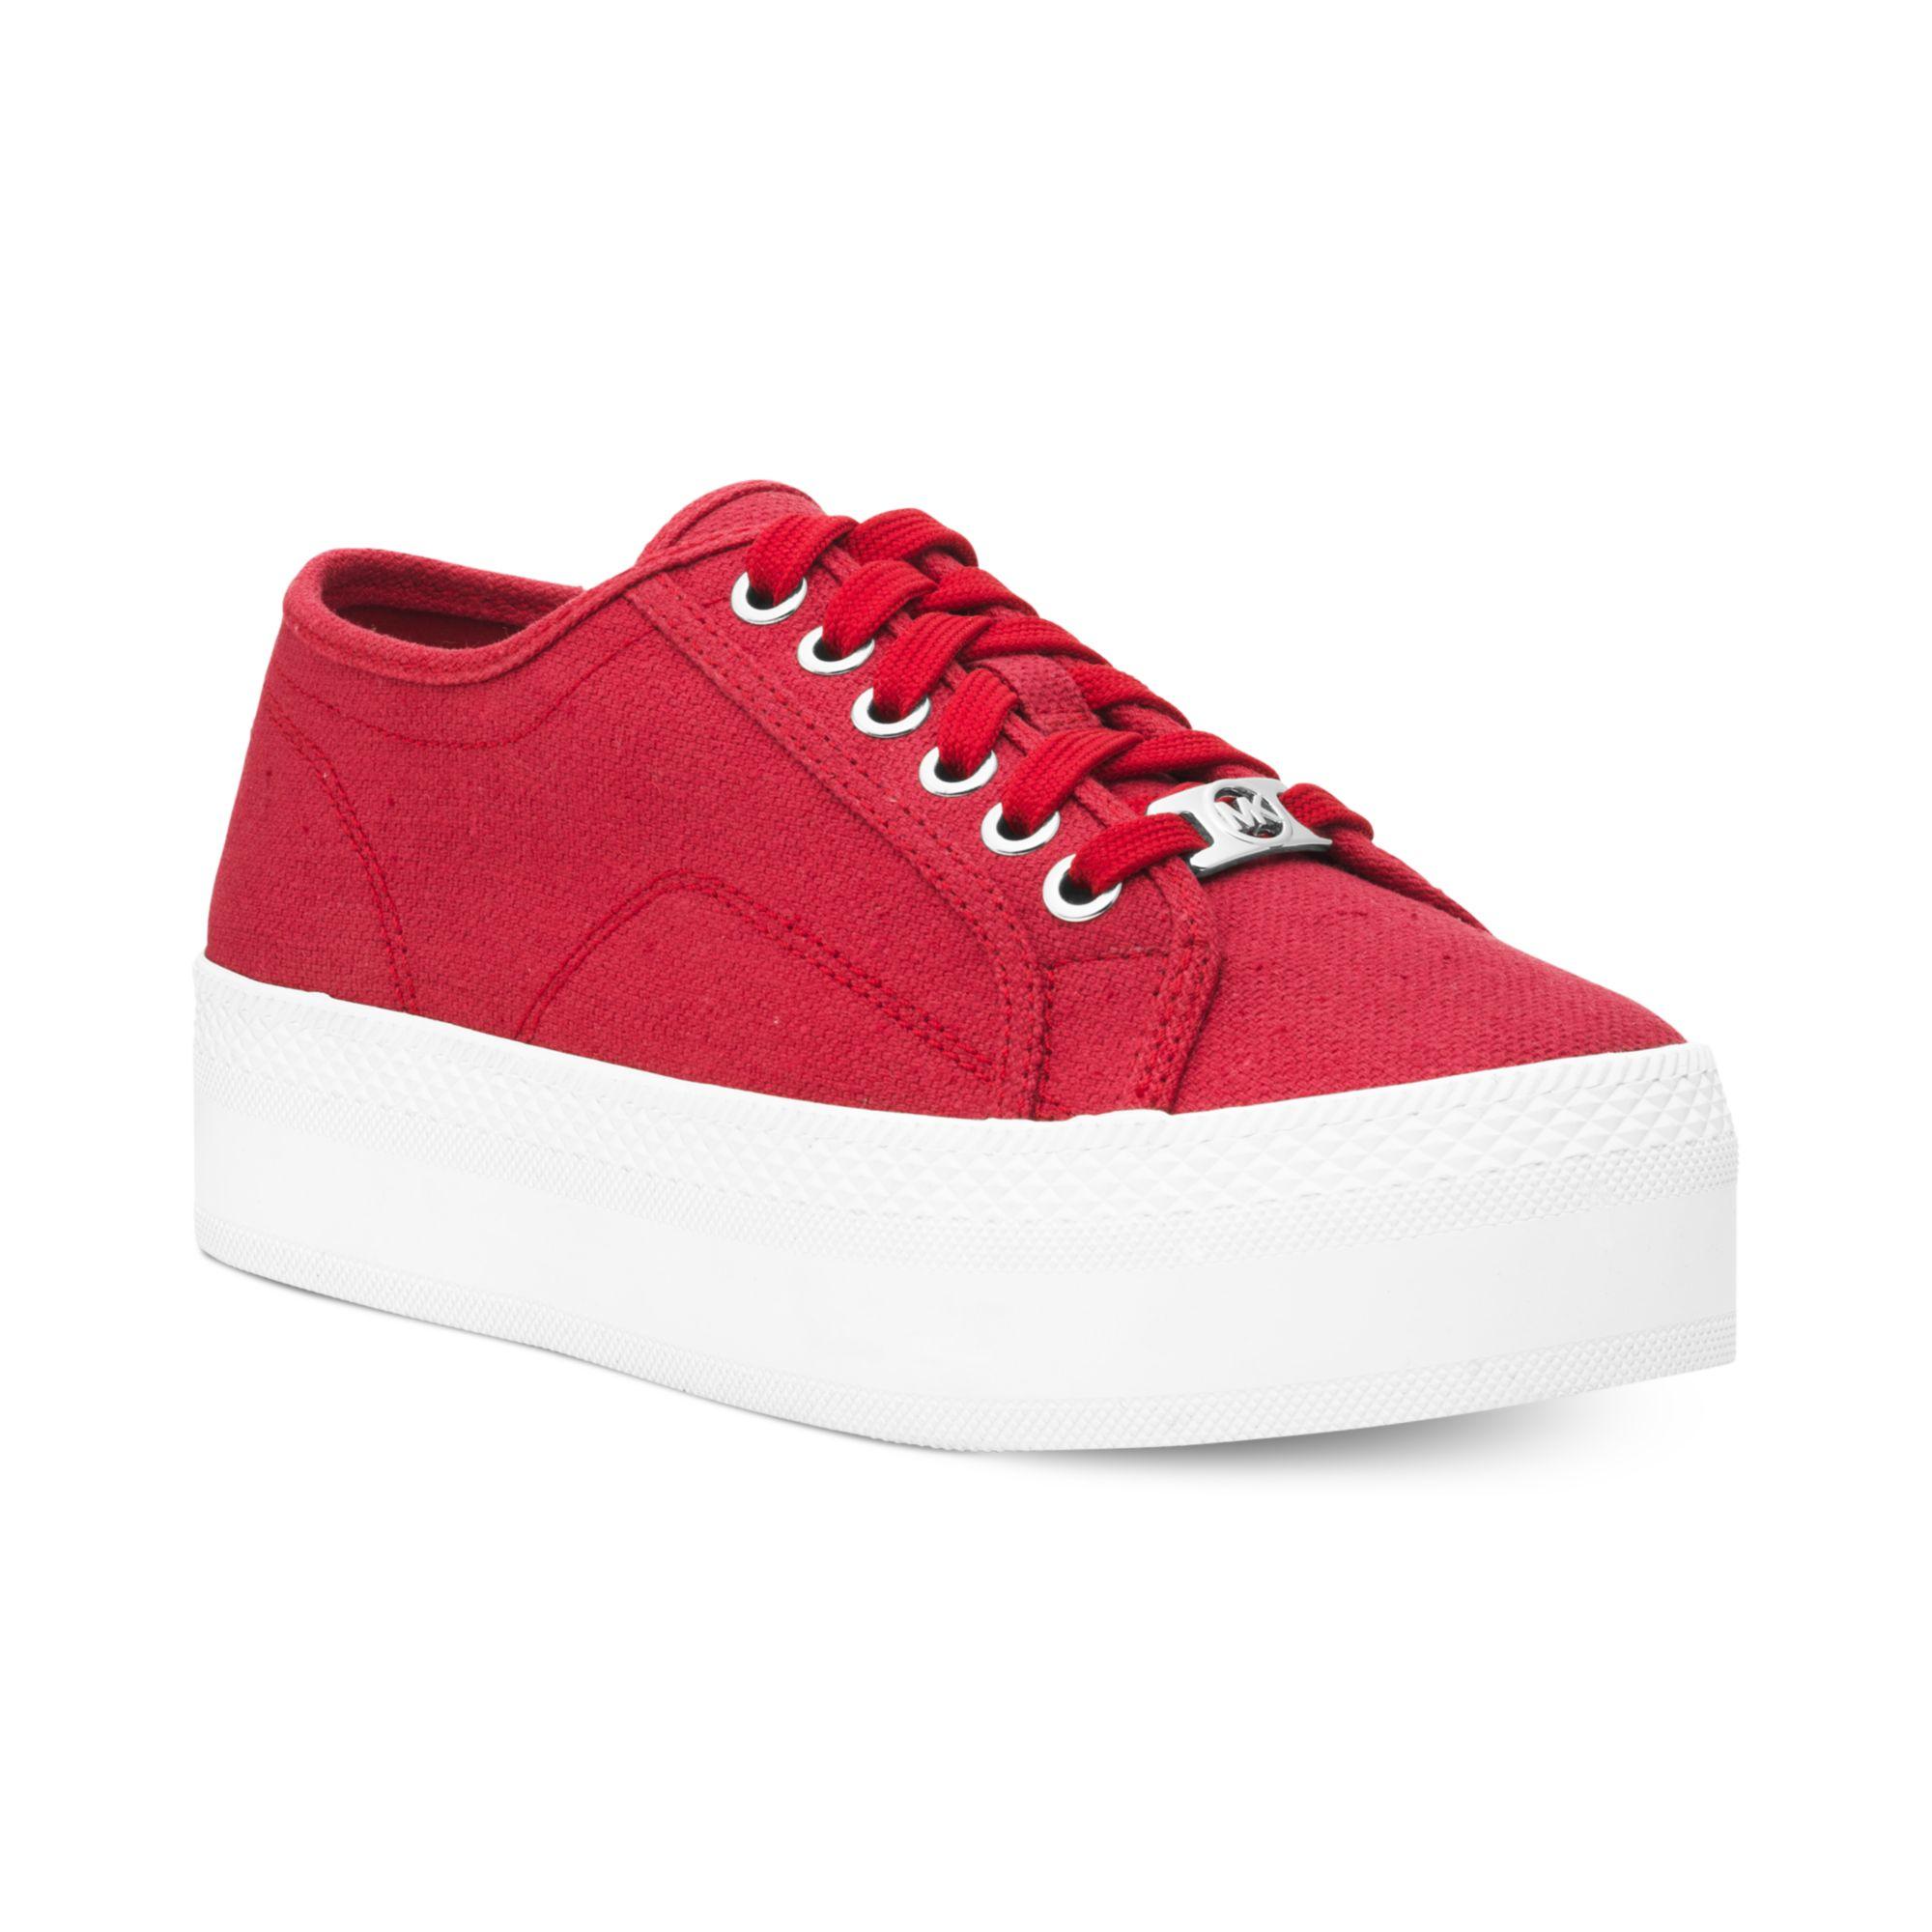 a876c87904e Lyst - Michael Kors Michael Boerum Platform Sneakers in Red